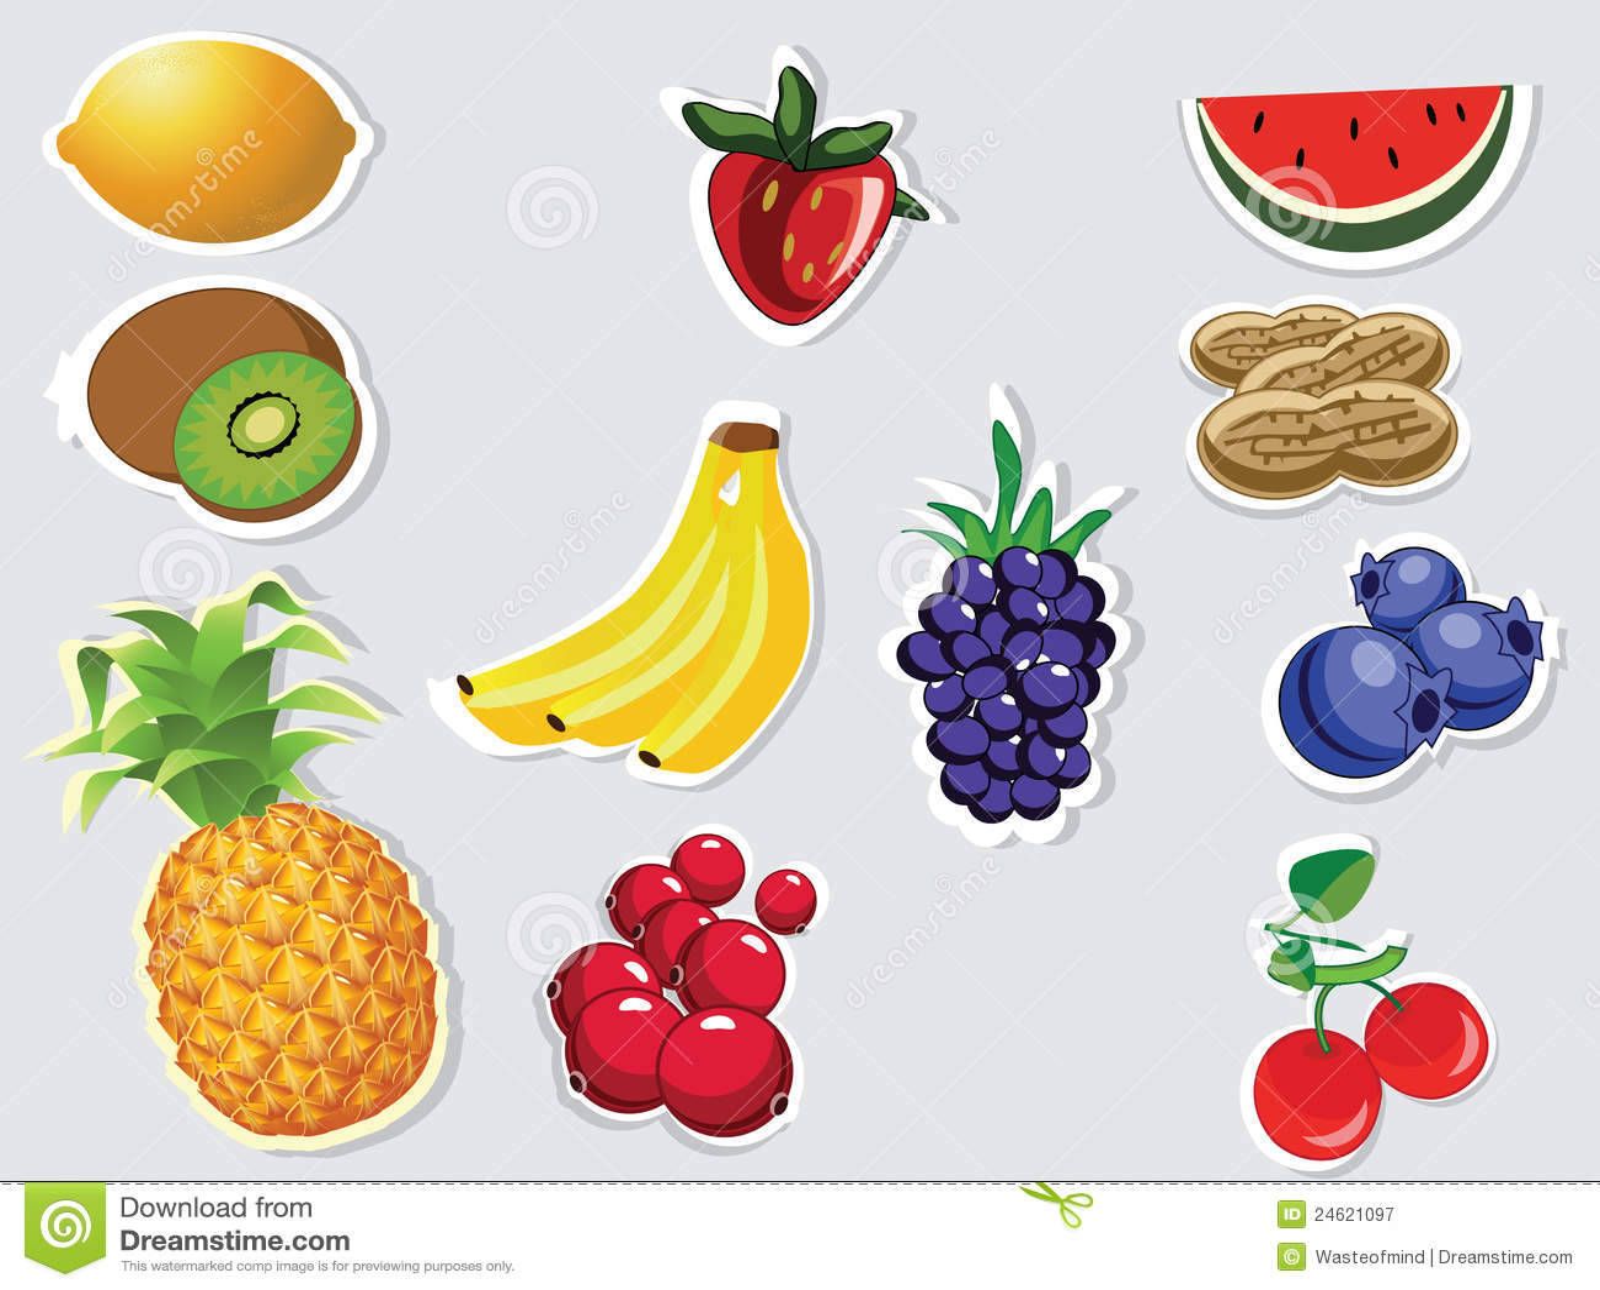 editable fruits on grey background stock illustration illustration